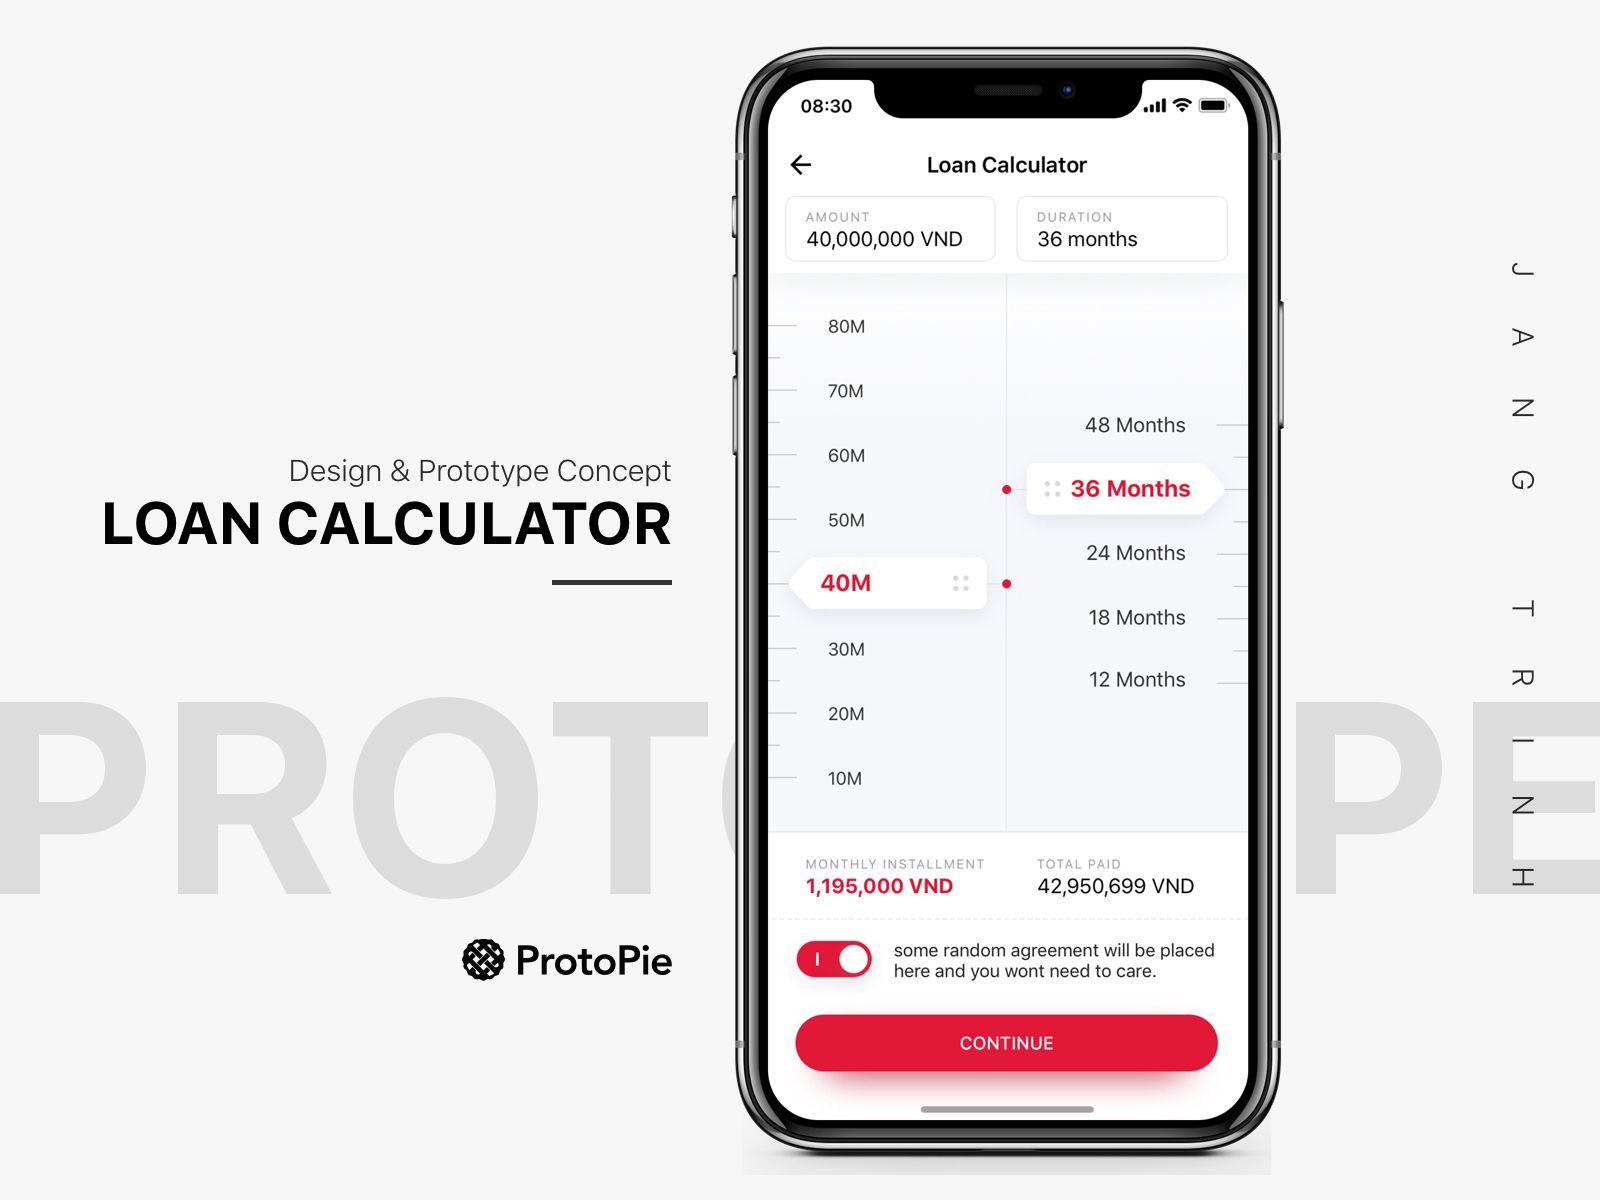 Loans Calculator Concept Protopie Link Included Calculator